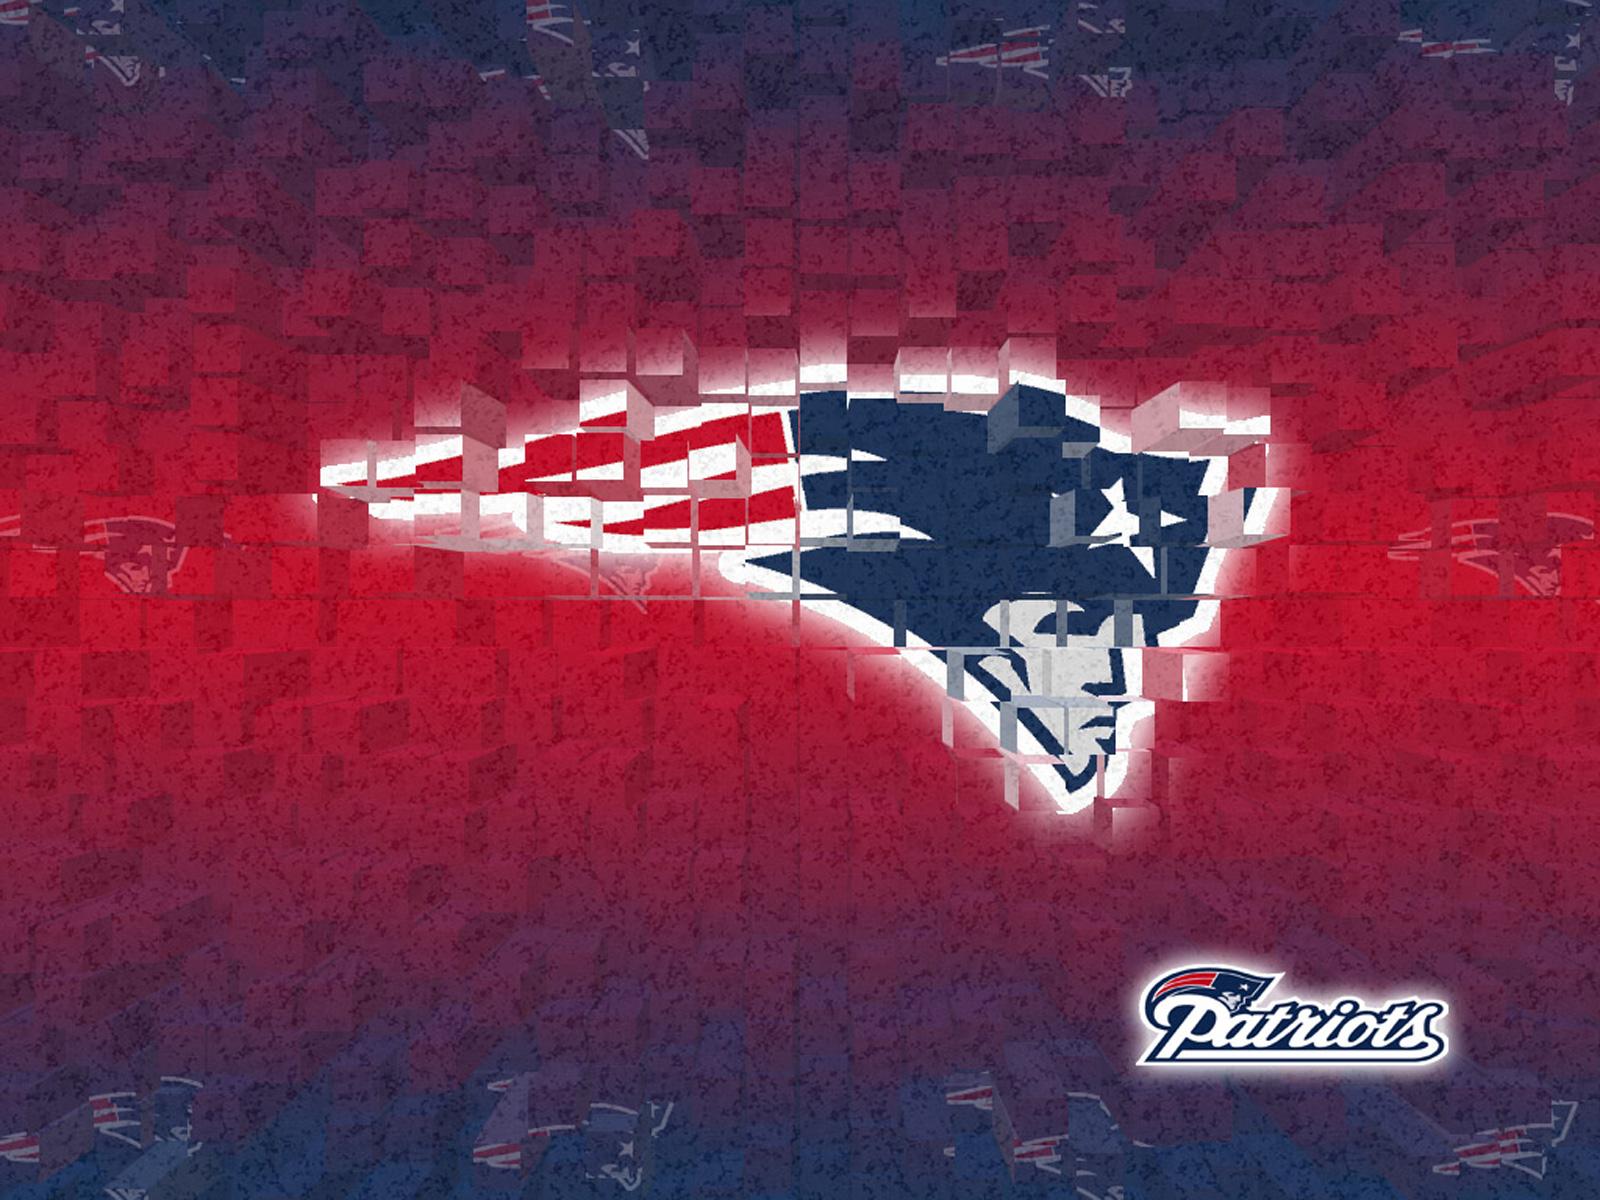 New England Patriots Wallpaper 5532 1600x1200 px